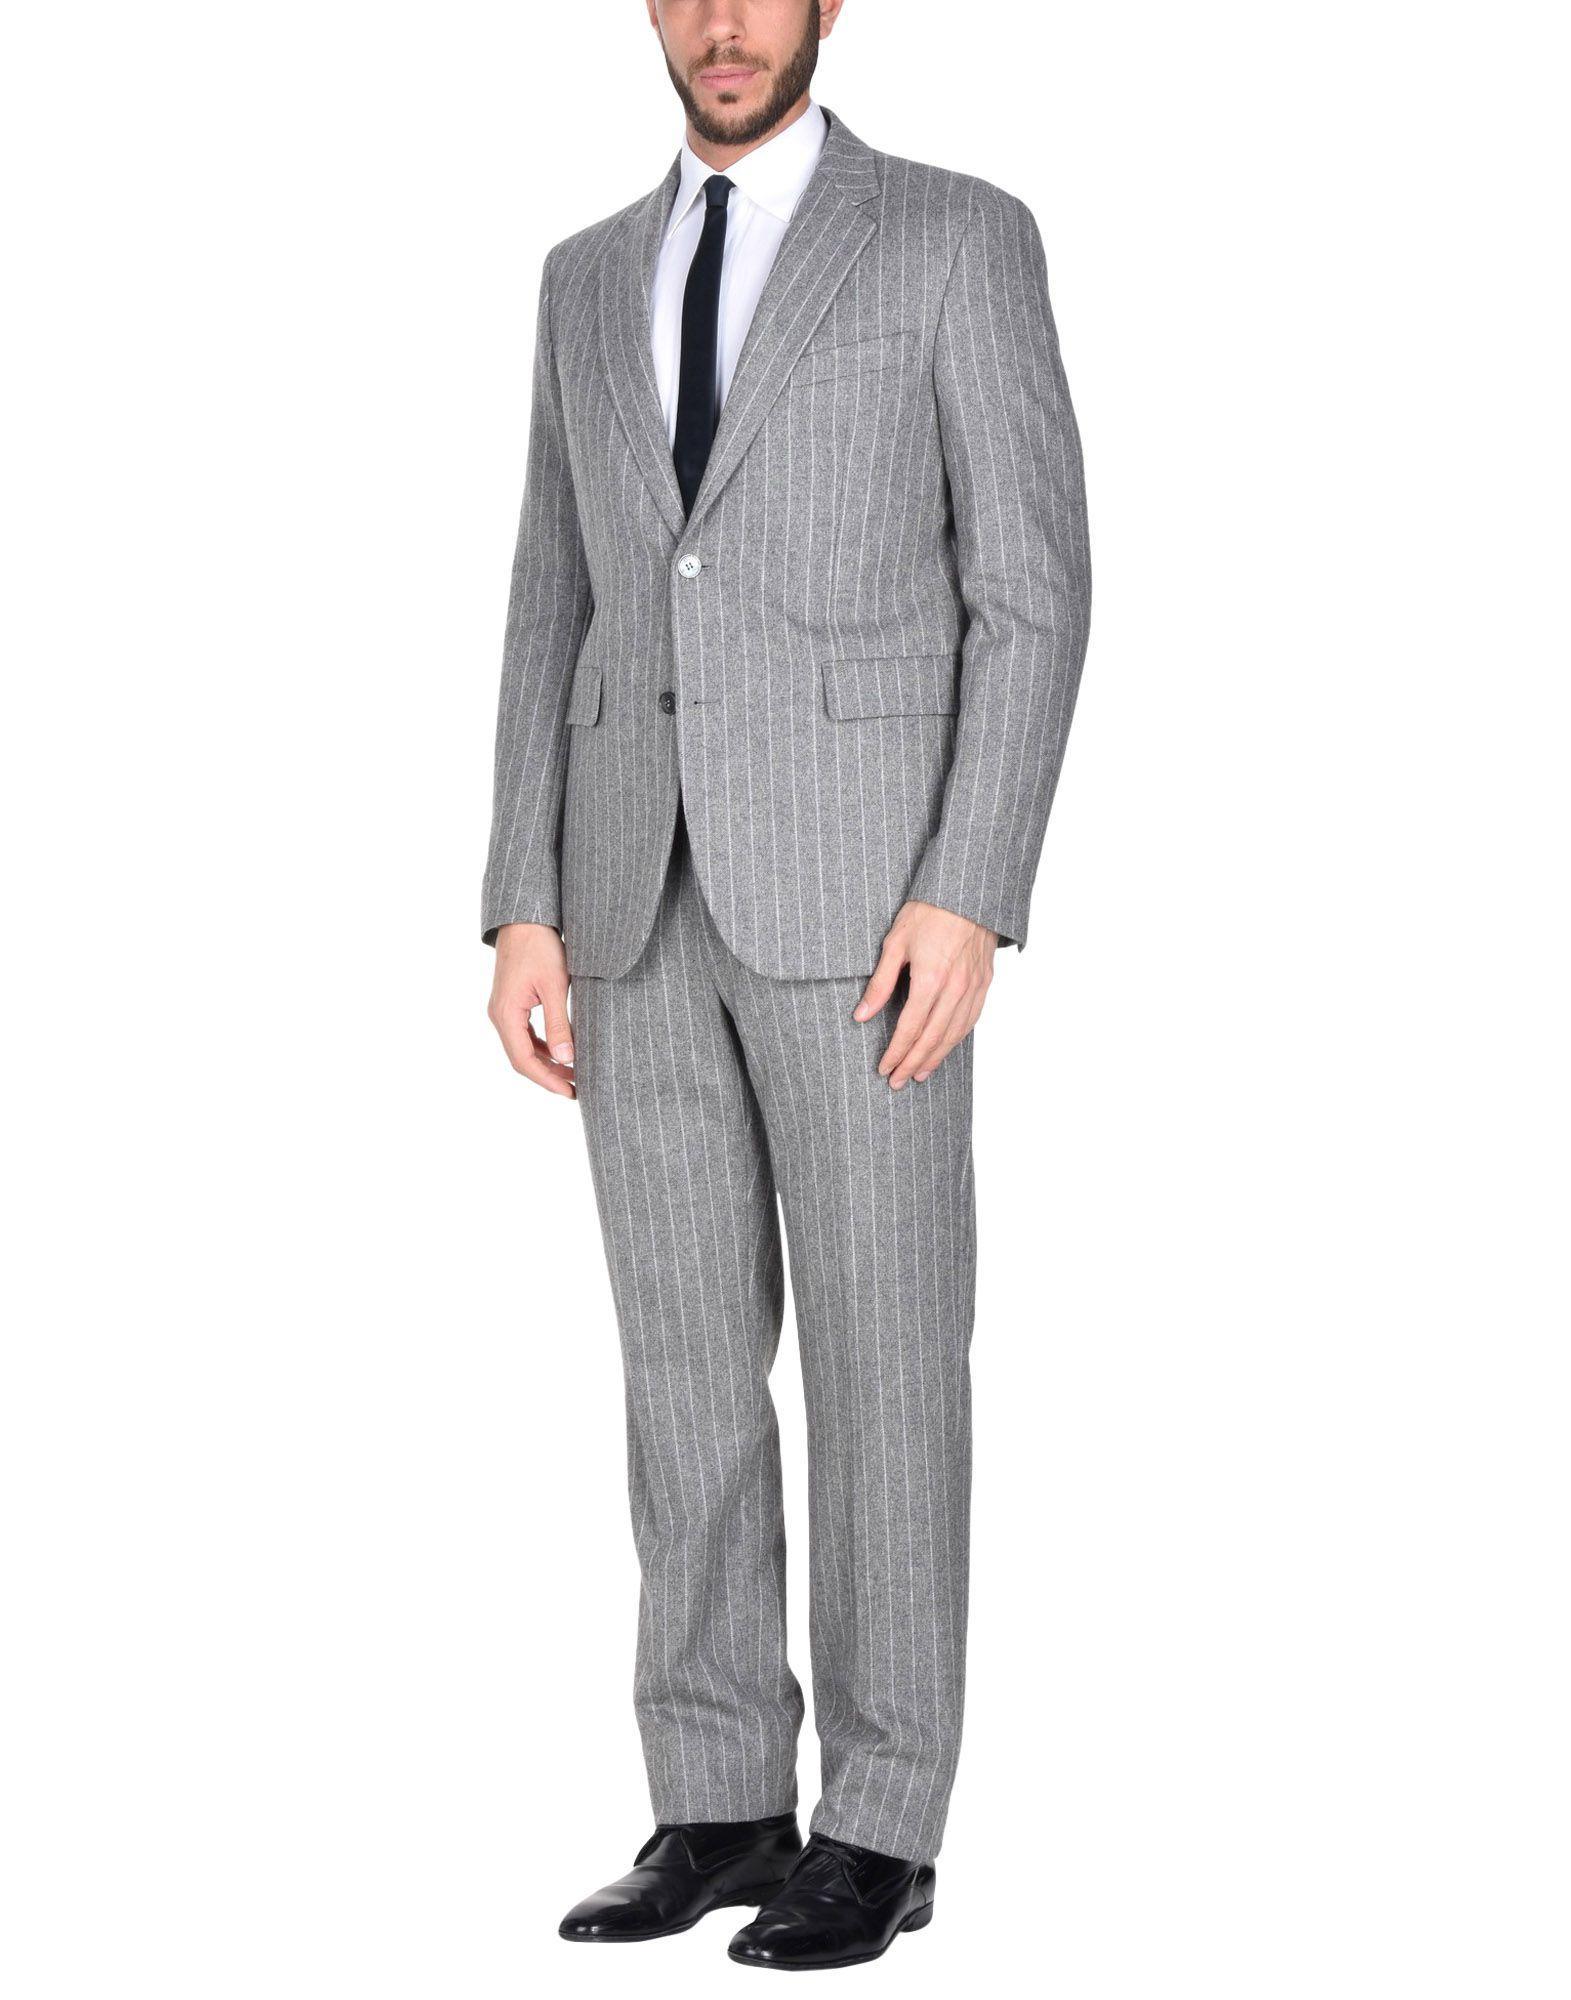 Manuel Ritz Suits In Light Grey